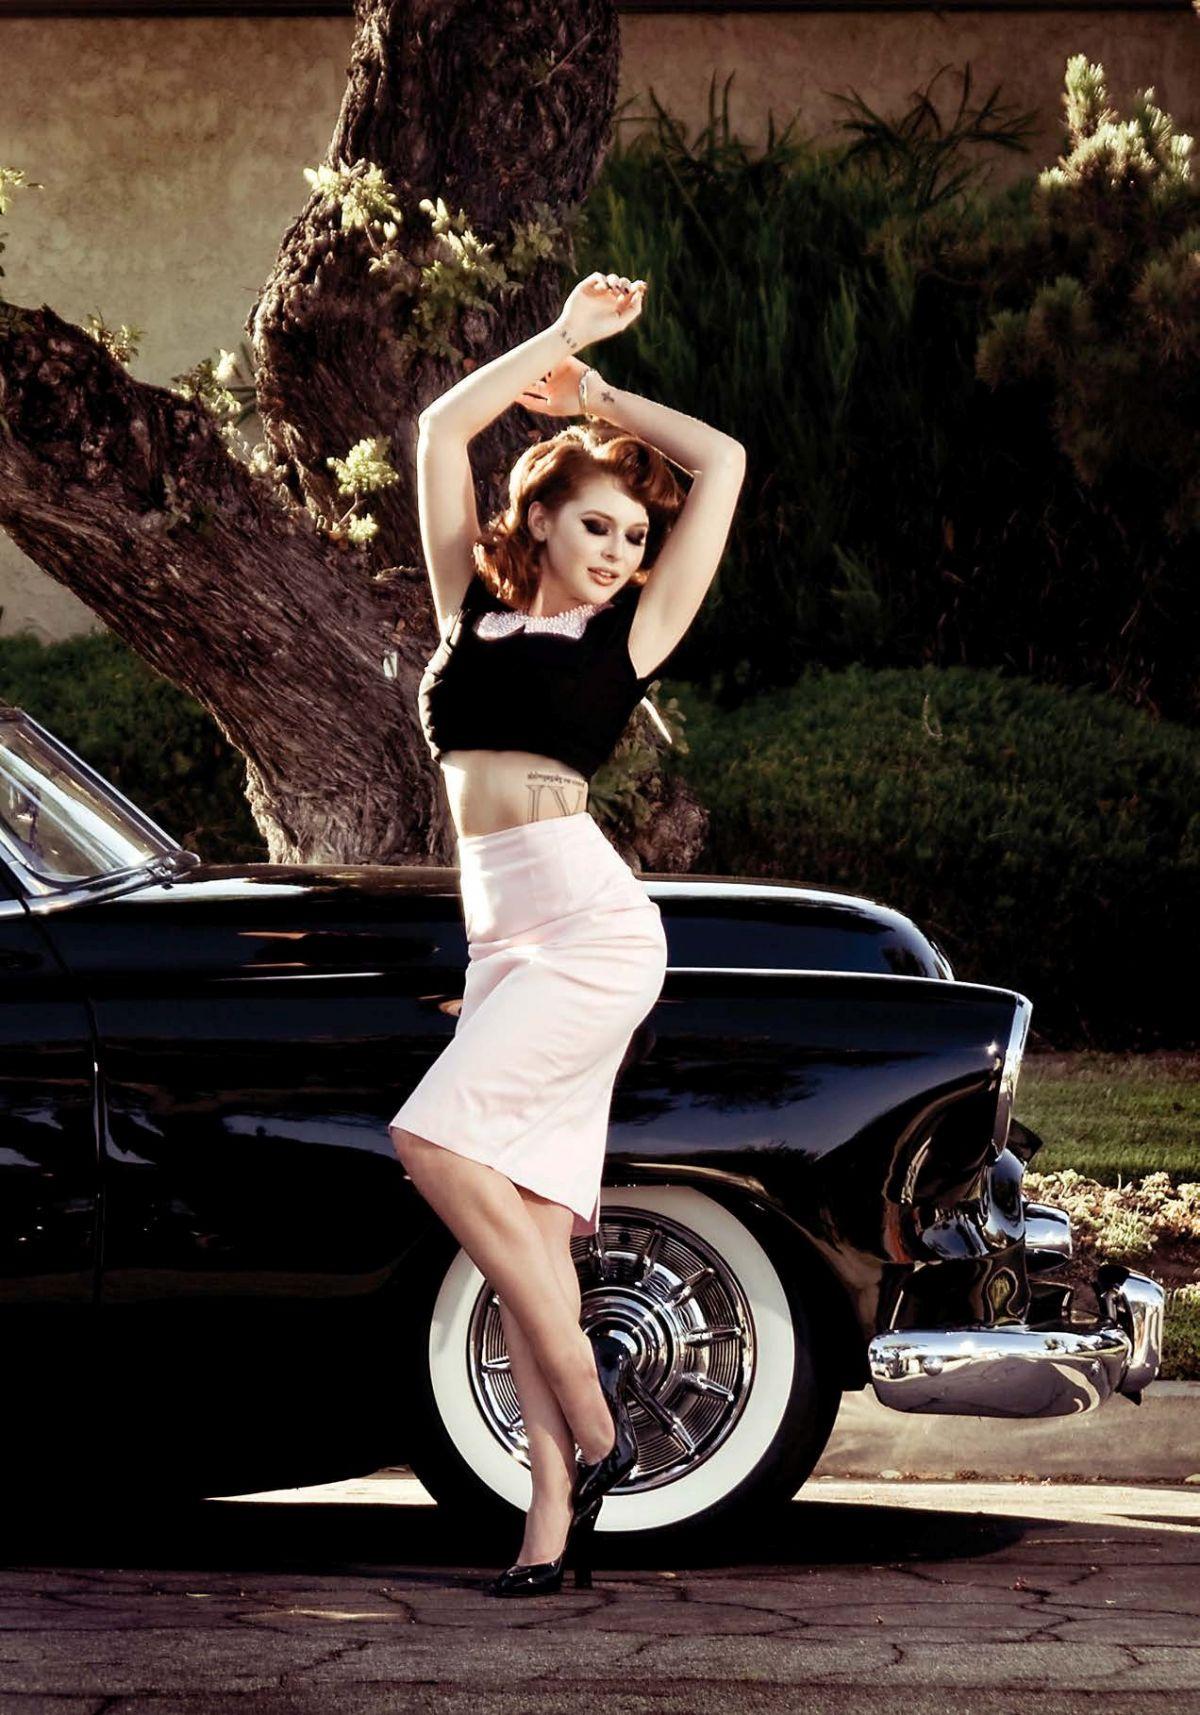 Chevy Girl Wallpaper Renee Olstead Deadbeat Magazine 31 Gotceleb